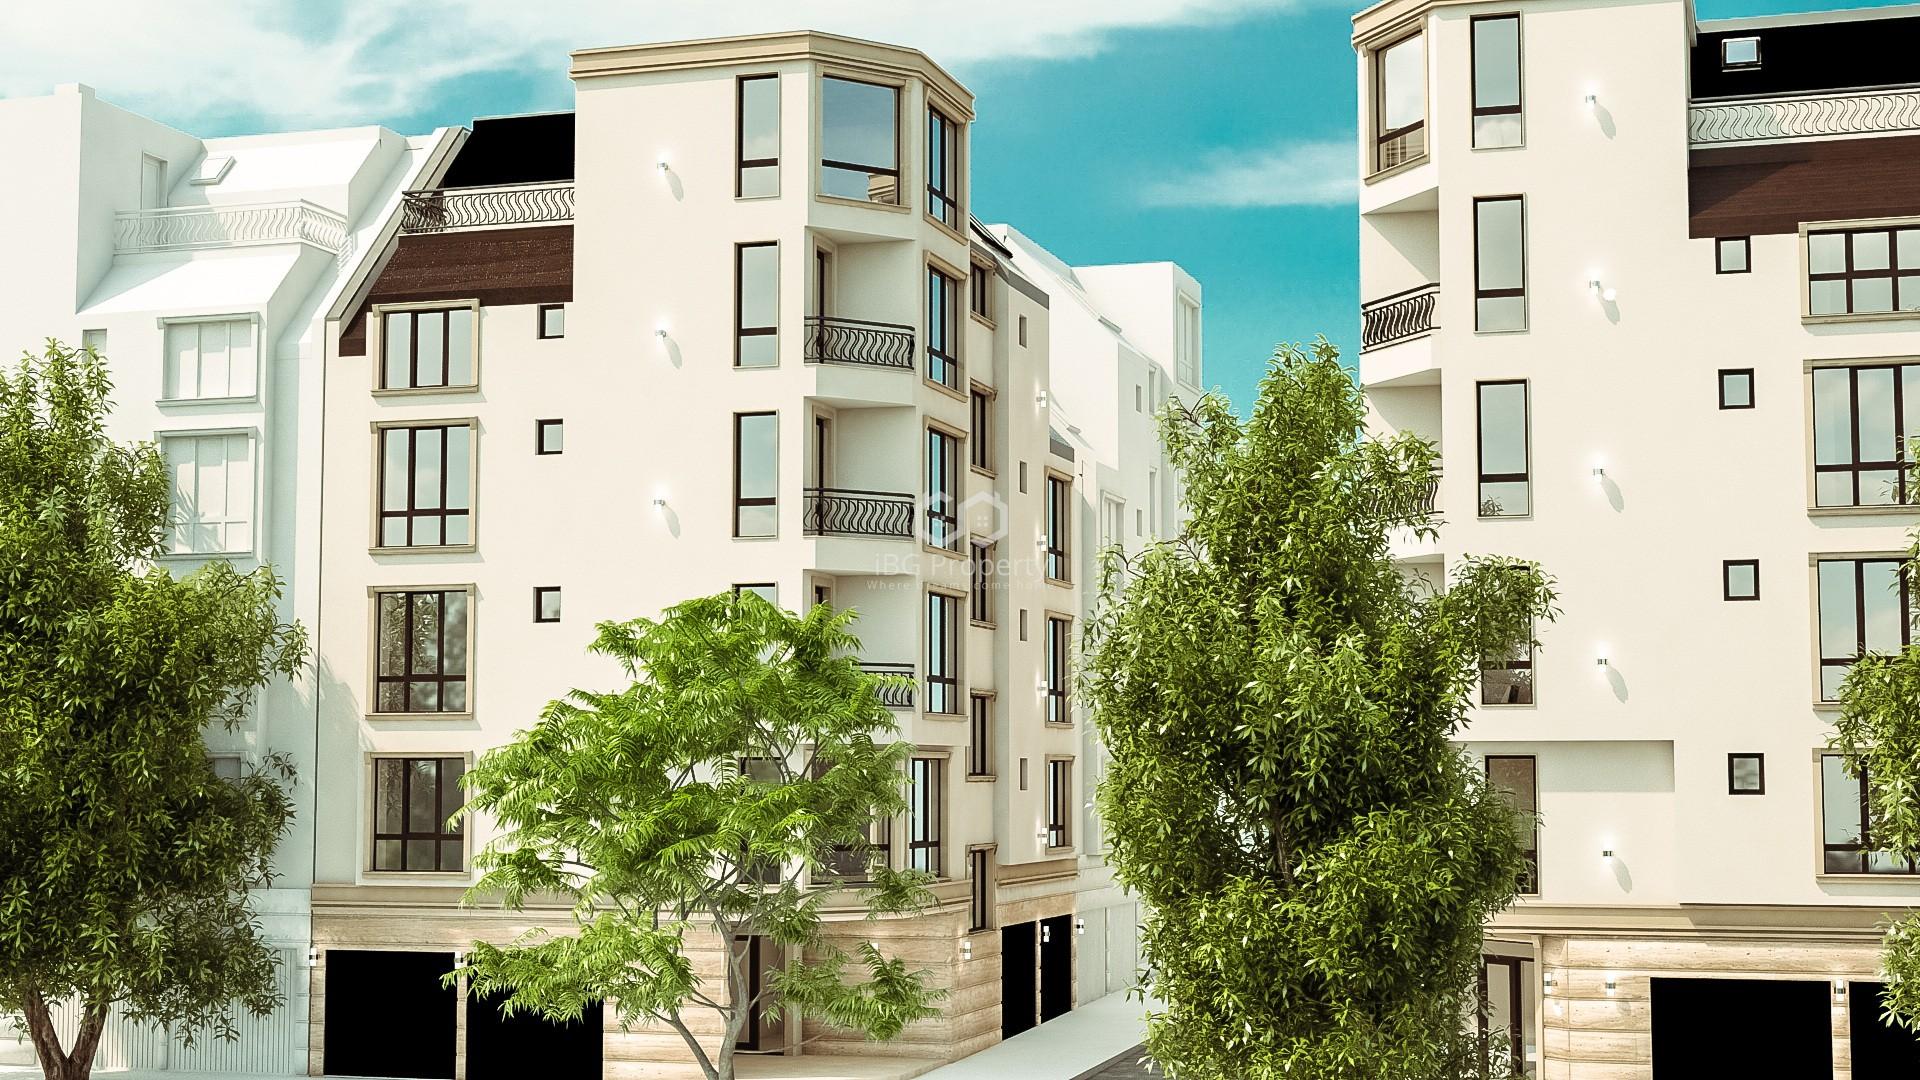 Тристаен апартамент Колхозен пазар Варна 134,24 m2